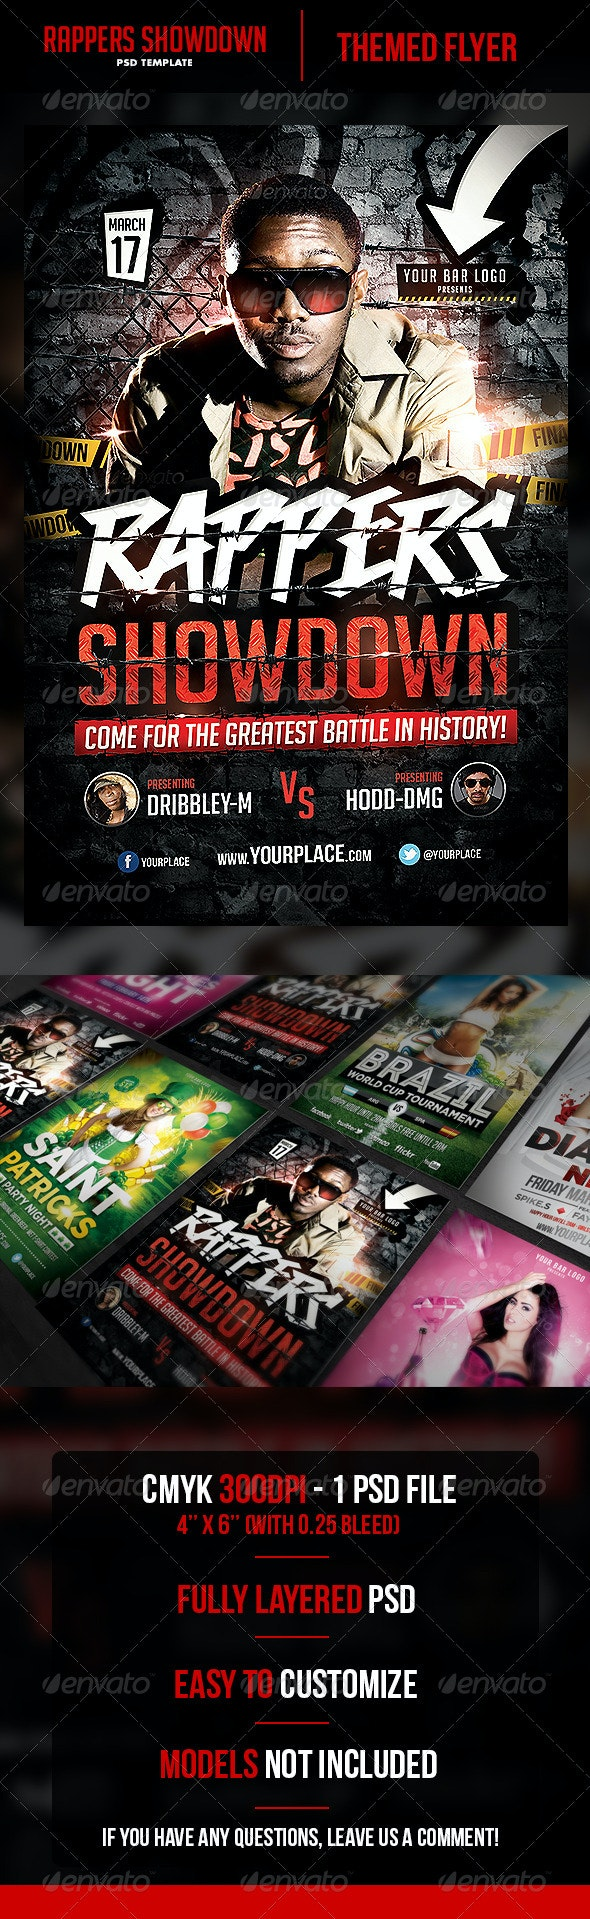 Rappers Showdown Flyer Template  - Flyers Print Templates